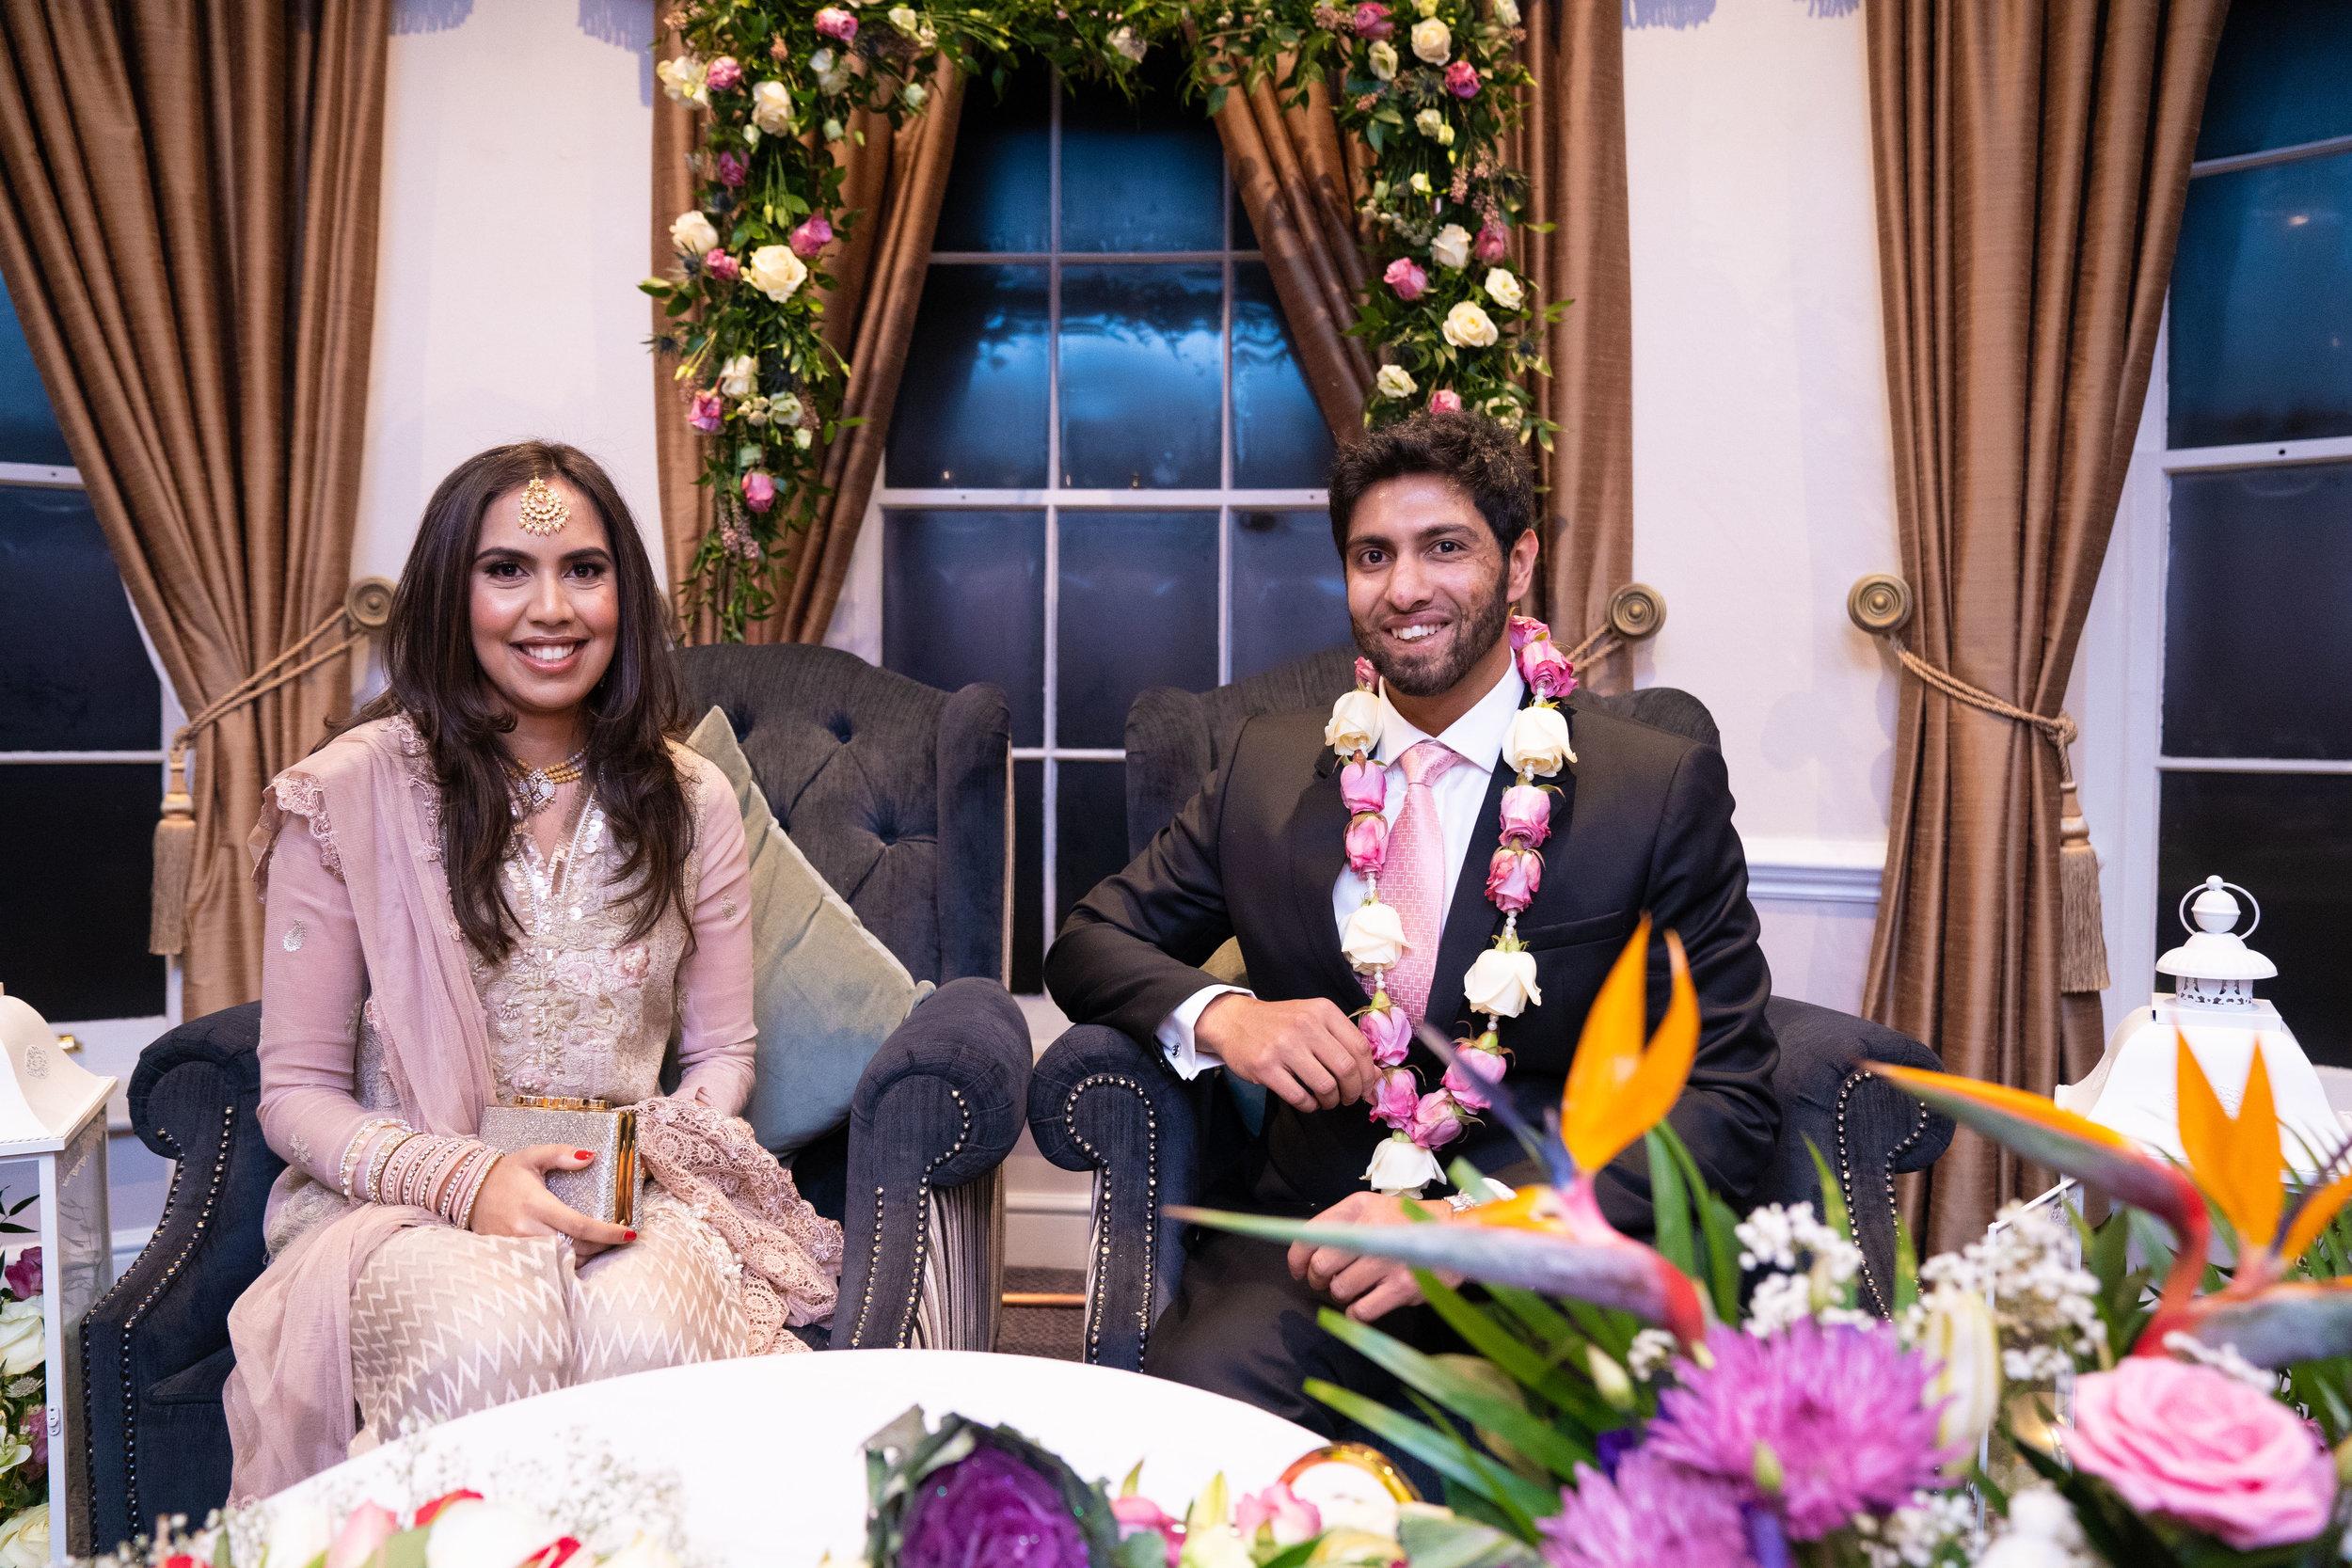 buckinghamshire-golf-club-winter-muslim-wedding-engagement-photography-videography-21